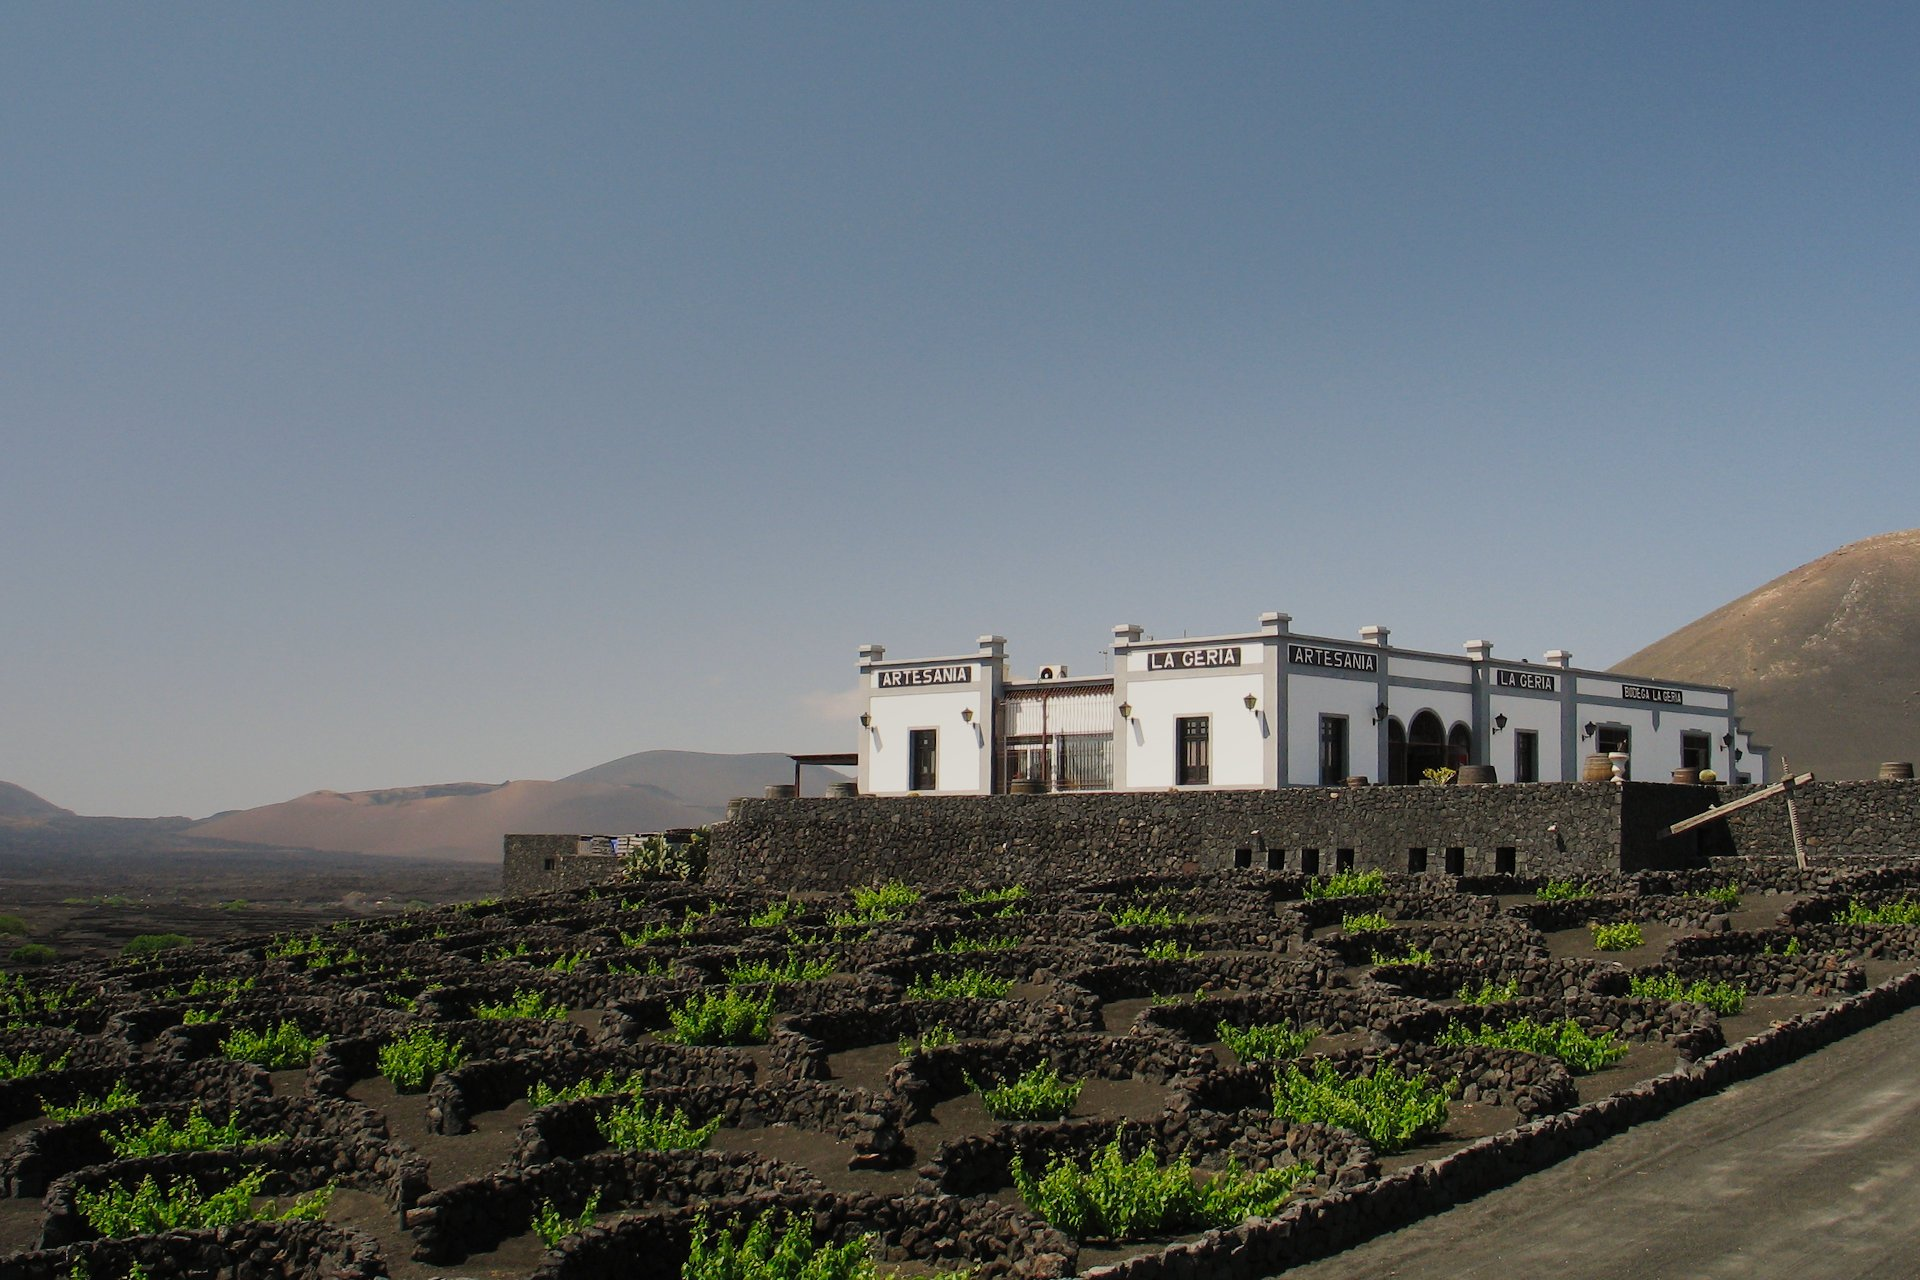 A Bodega in La Geria, Lanzarote